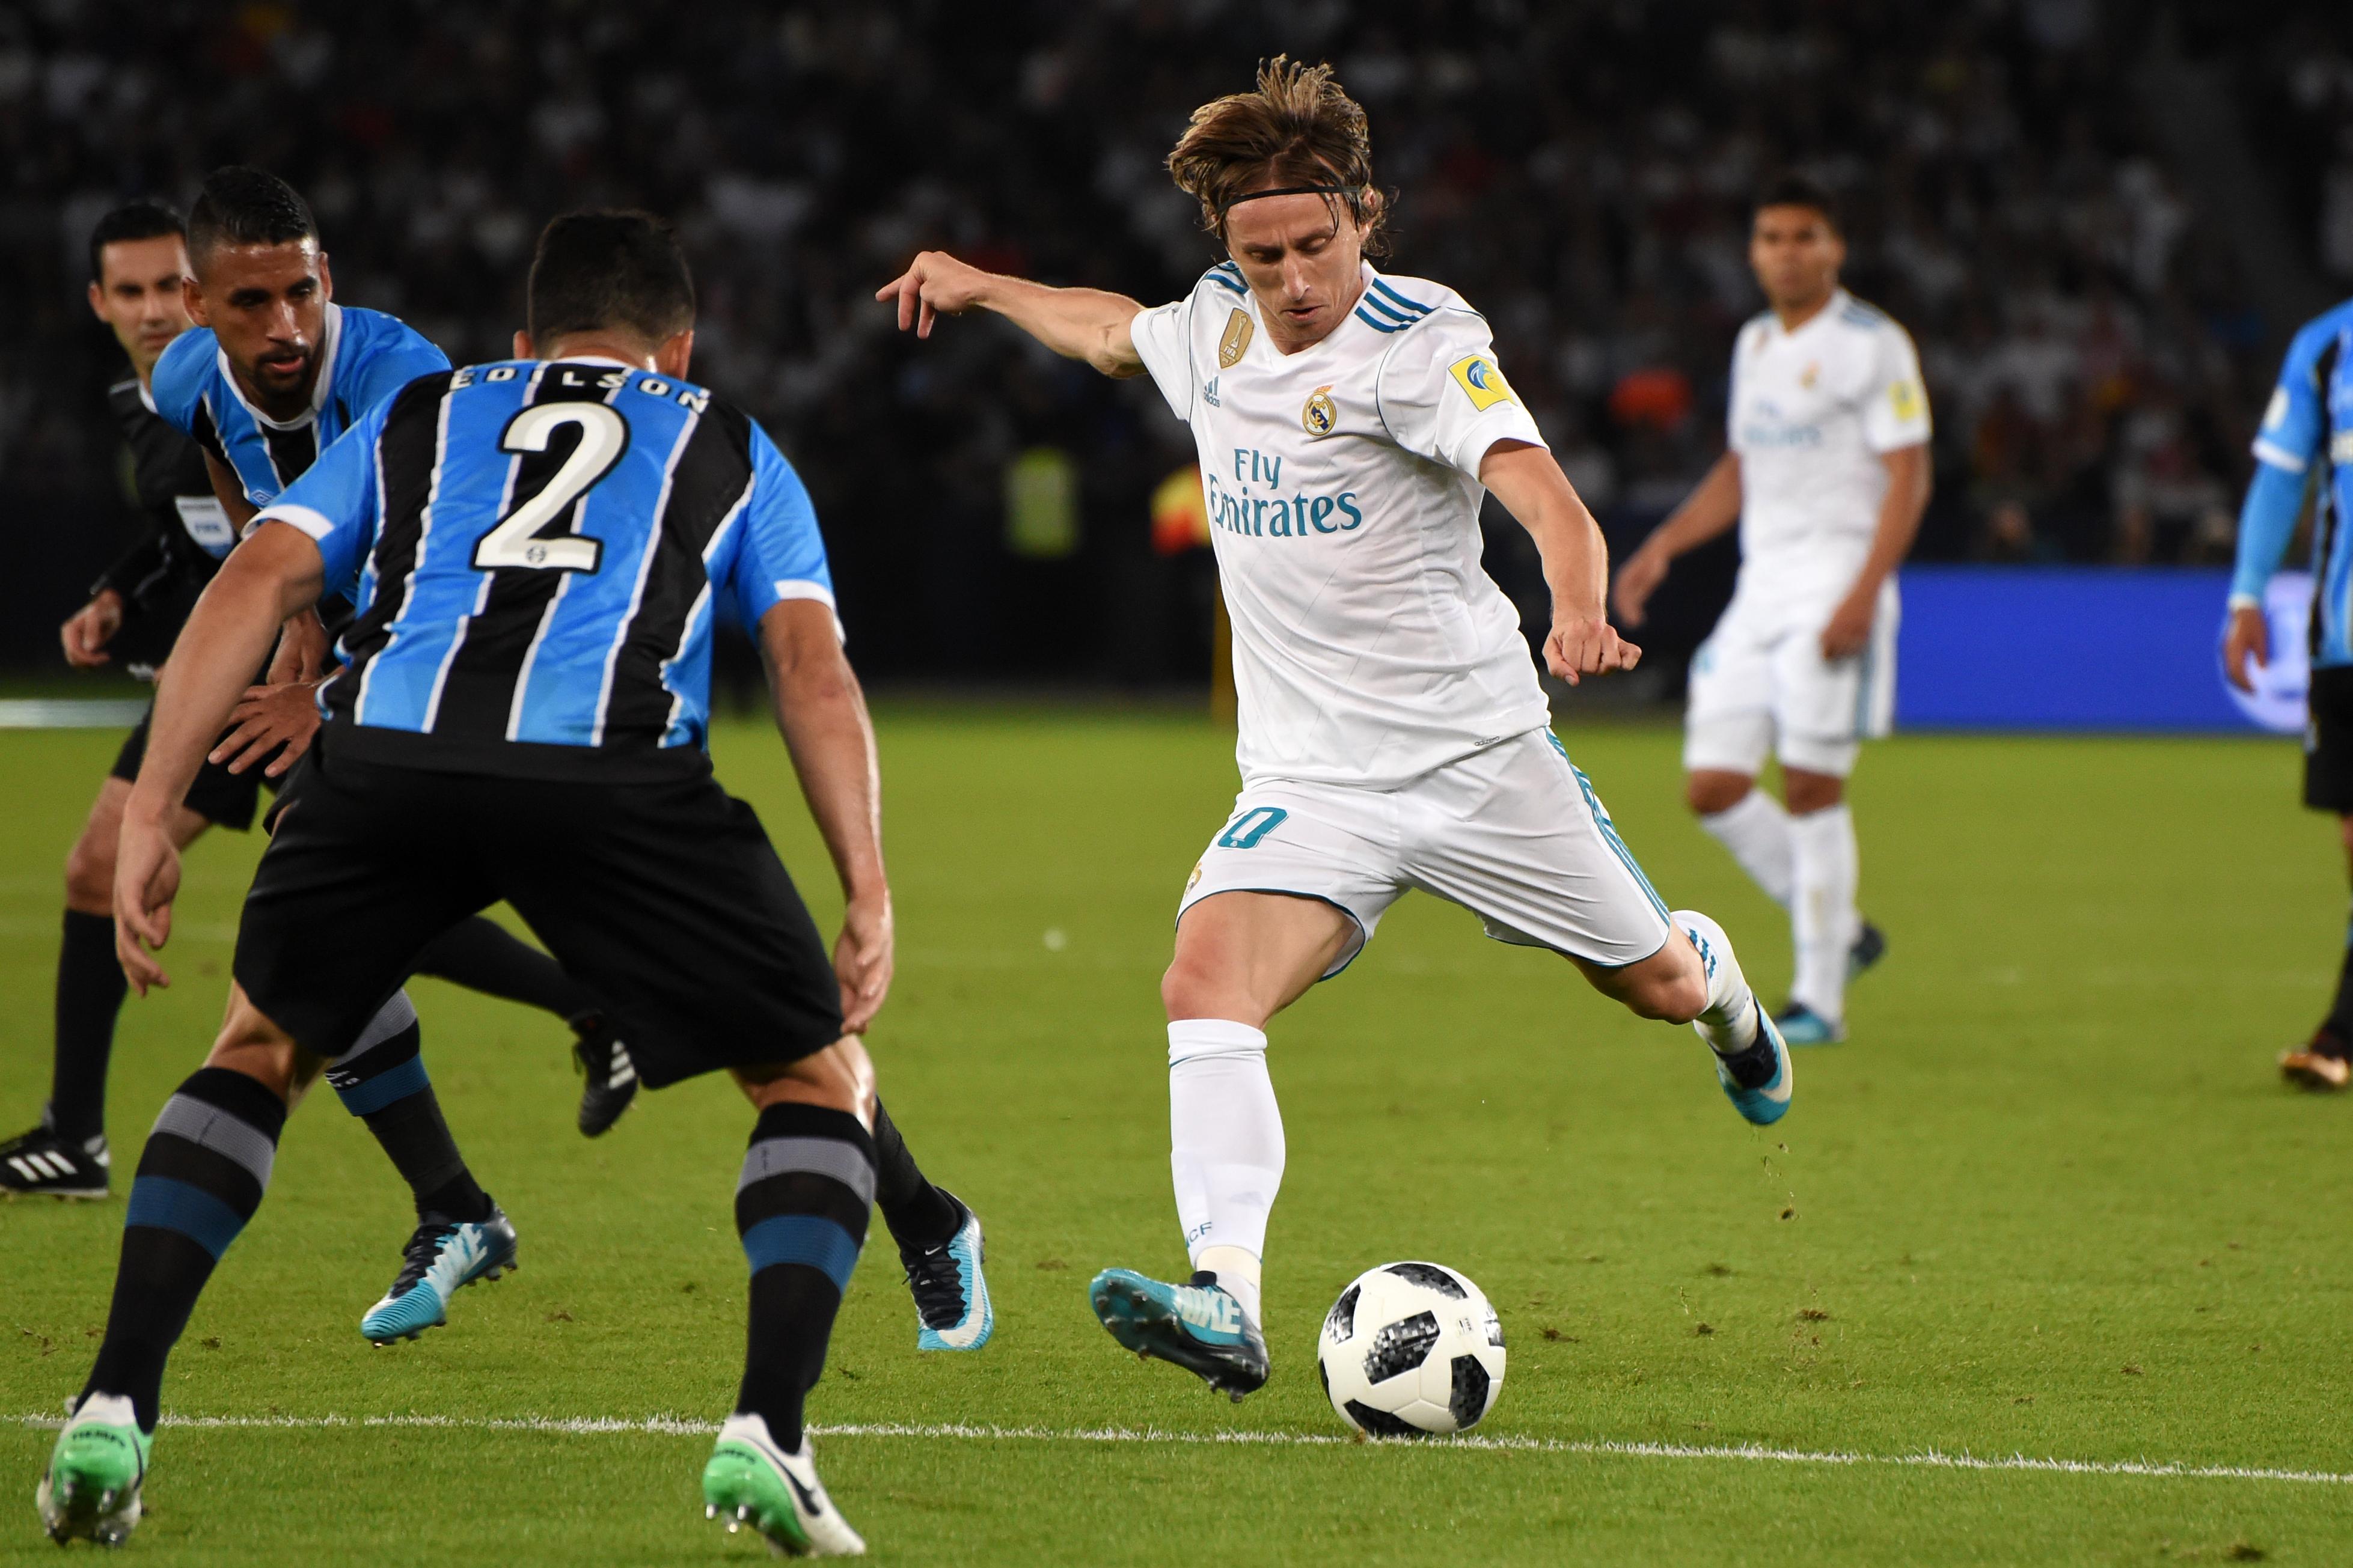 Player Ratings Real Madrid 2: Real Madrid 1-0 Grêmio: Player Ratings